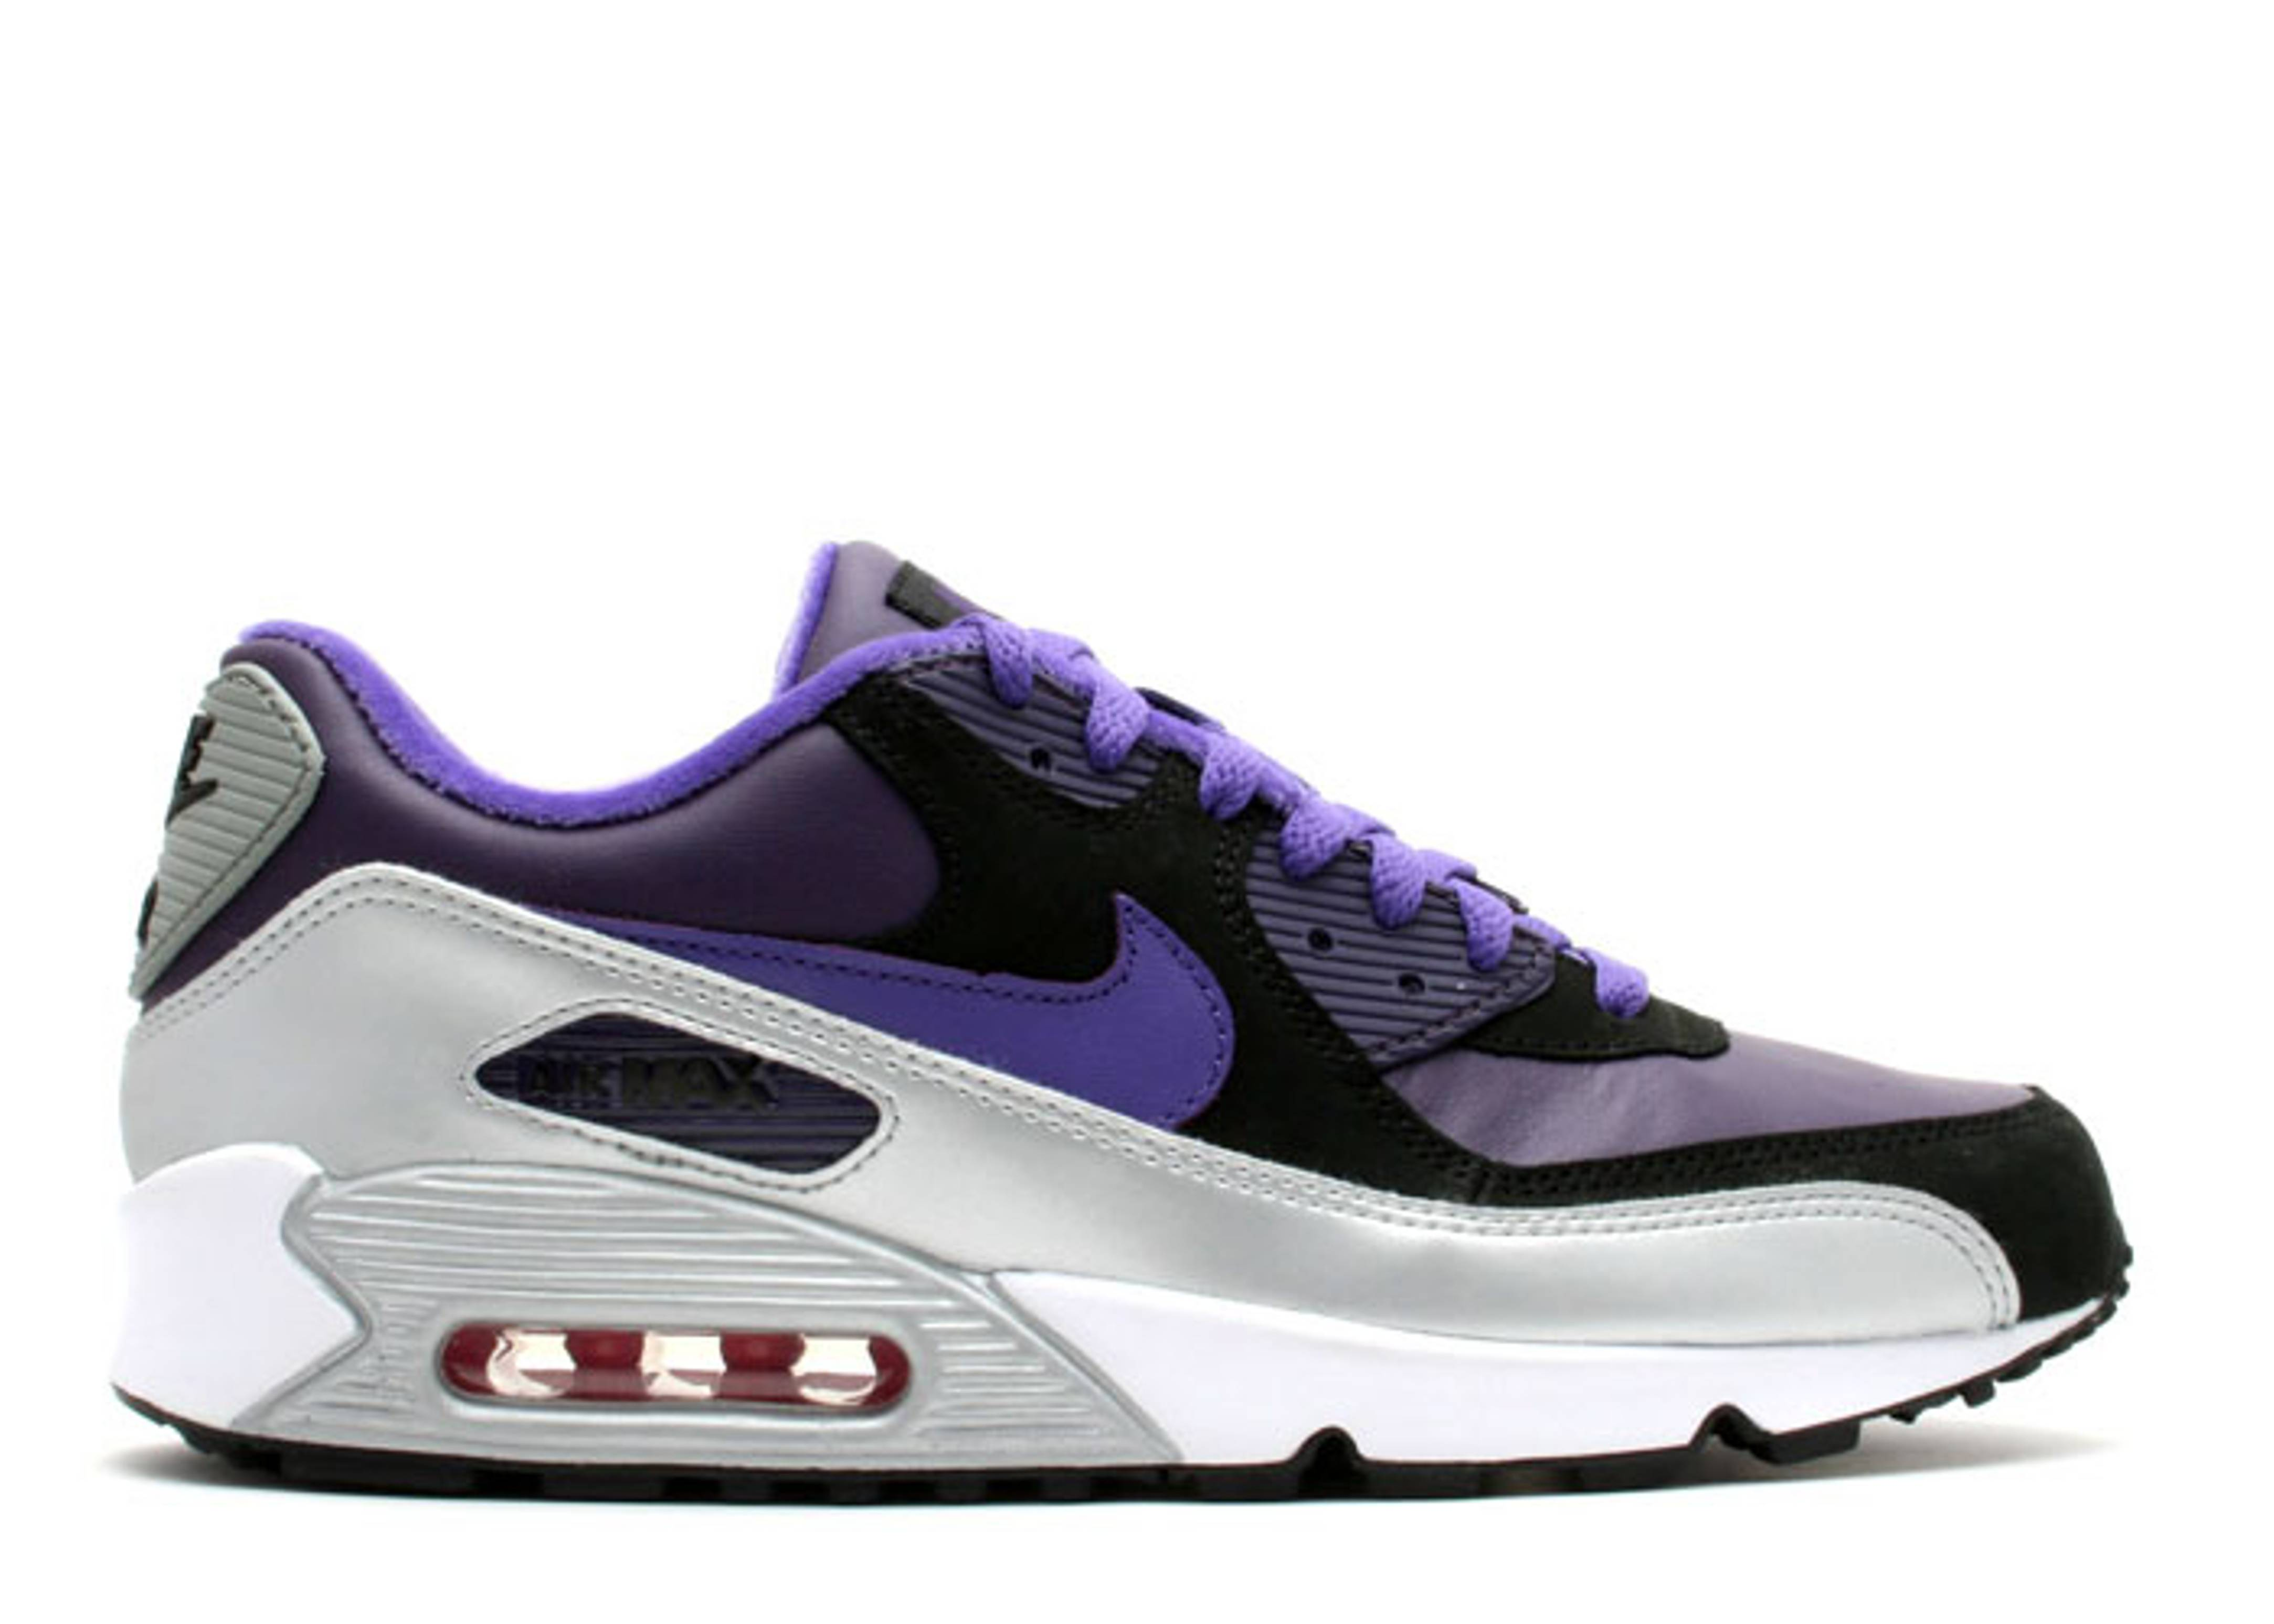 low priced 01d0f f6bac Air Max 90 Premium - Nike - 313650 501 - varsity purple ...